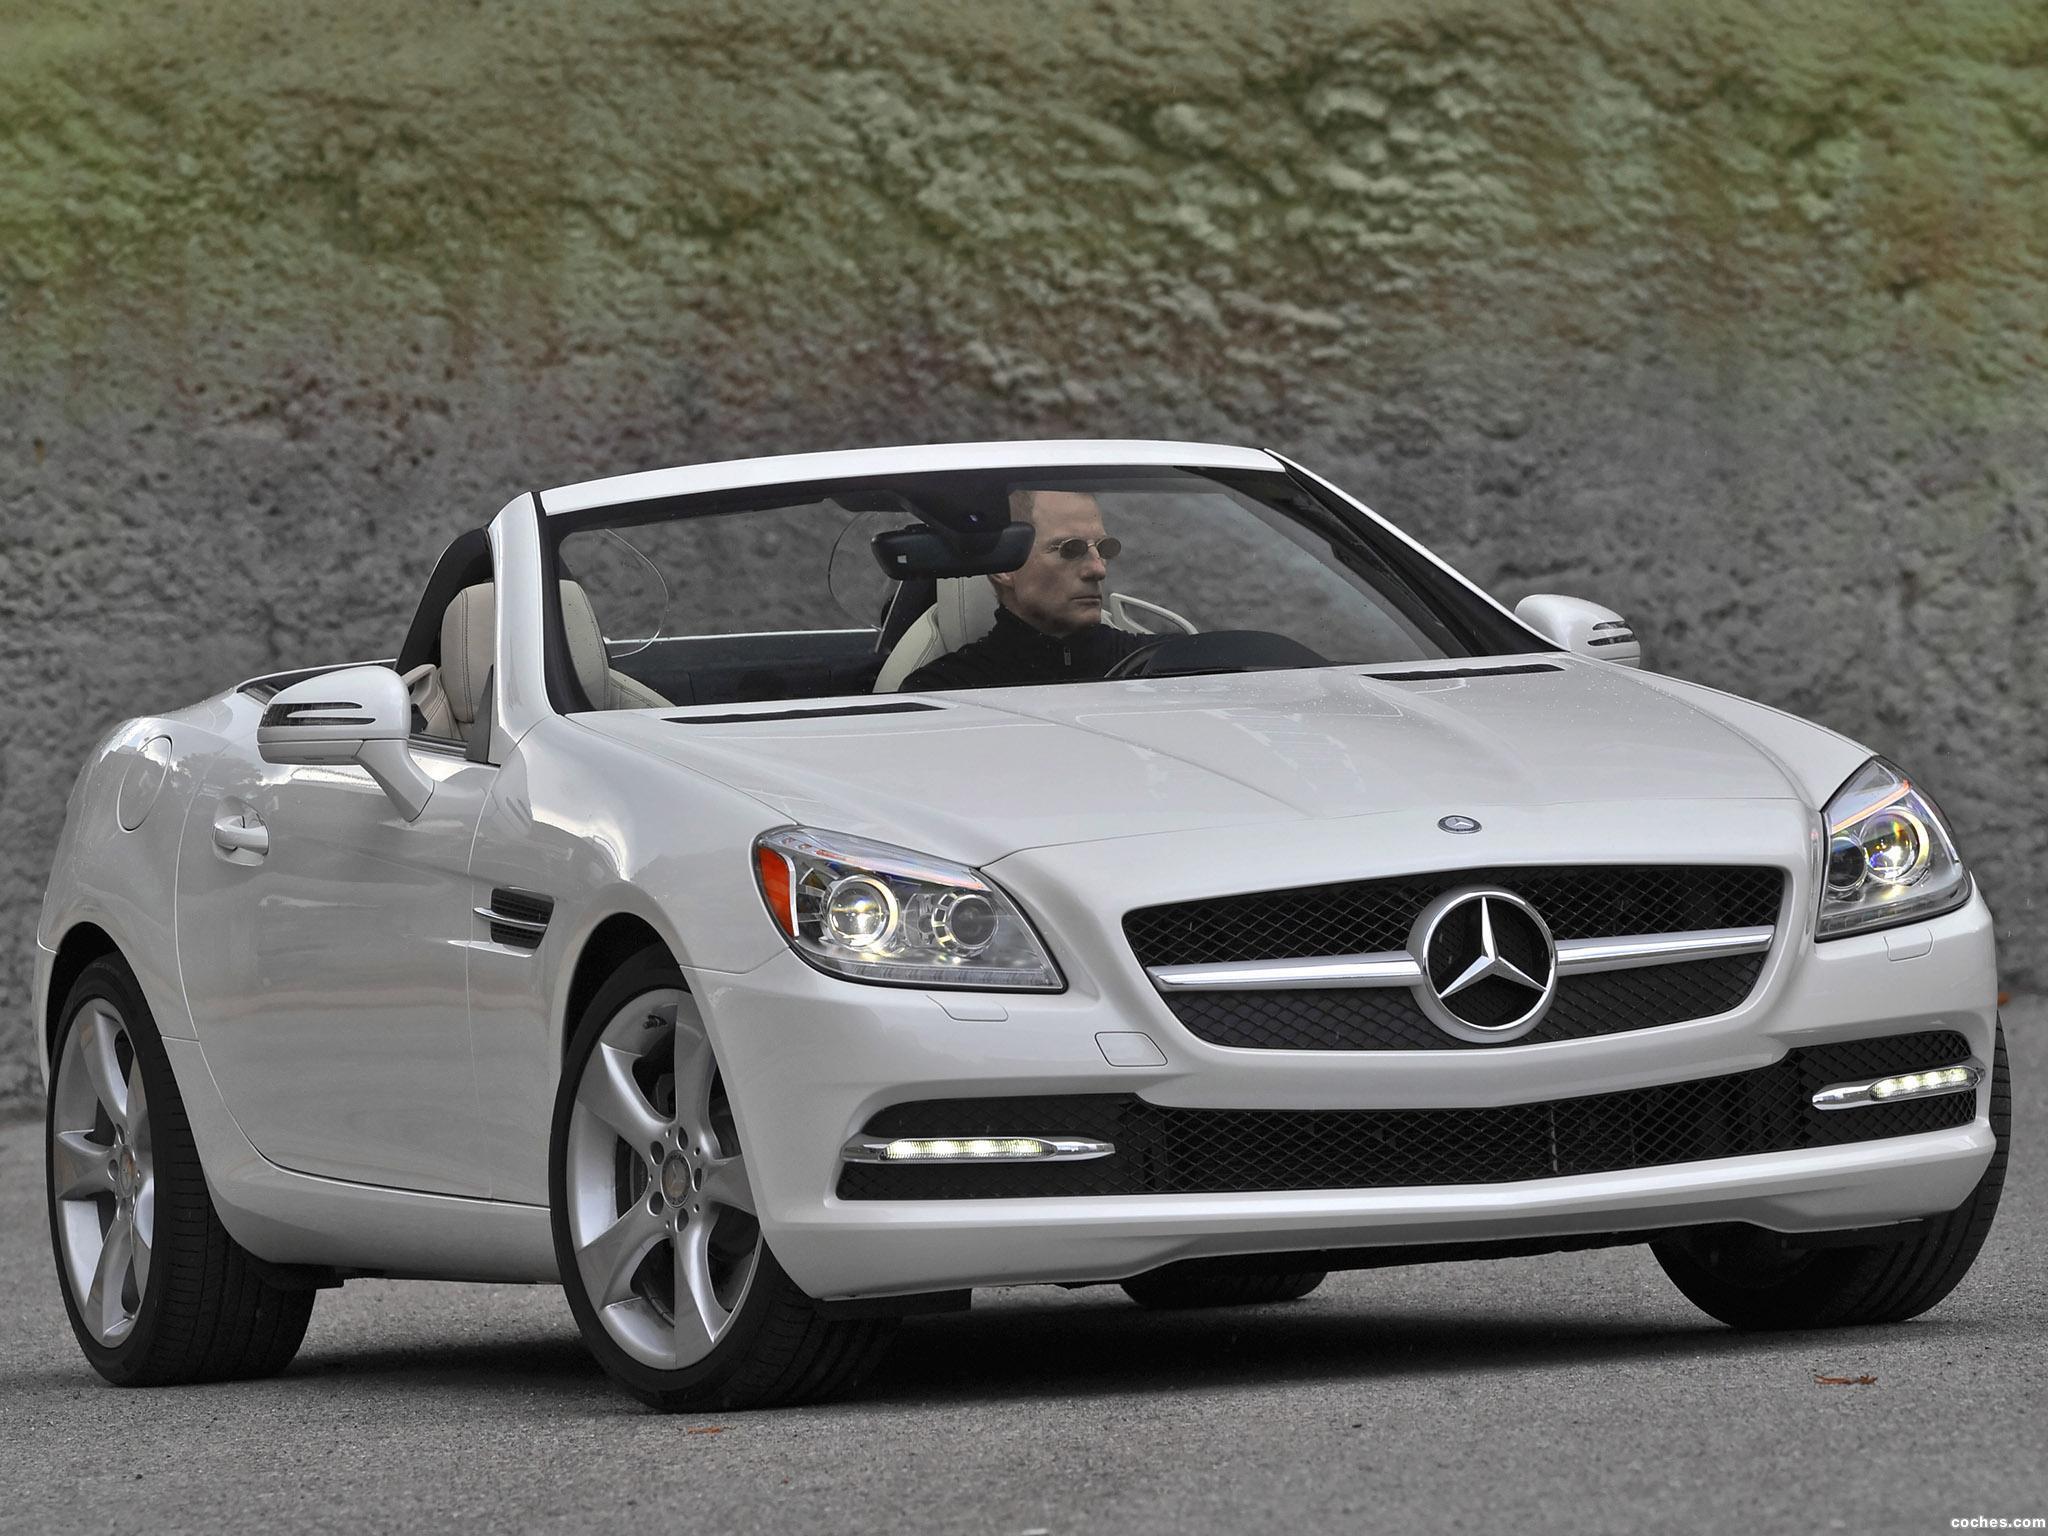 Foto 6 de Mercedes Clase SLK 350 USA 2011